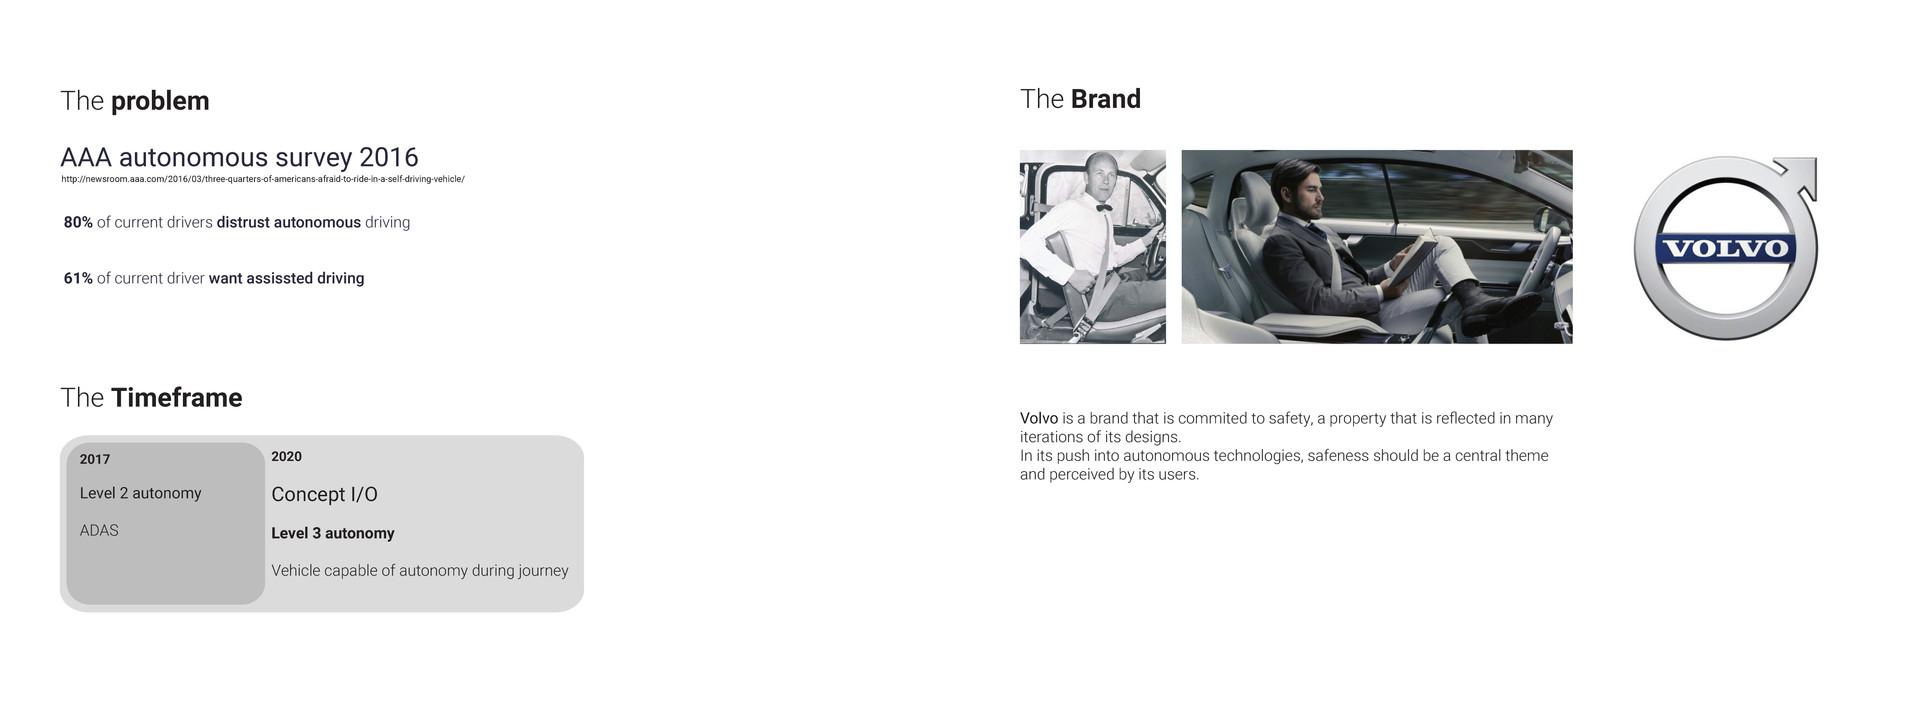 portfolio for web_Page_15.jpg